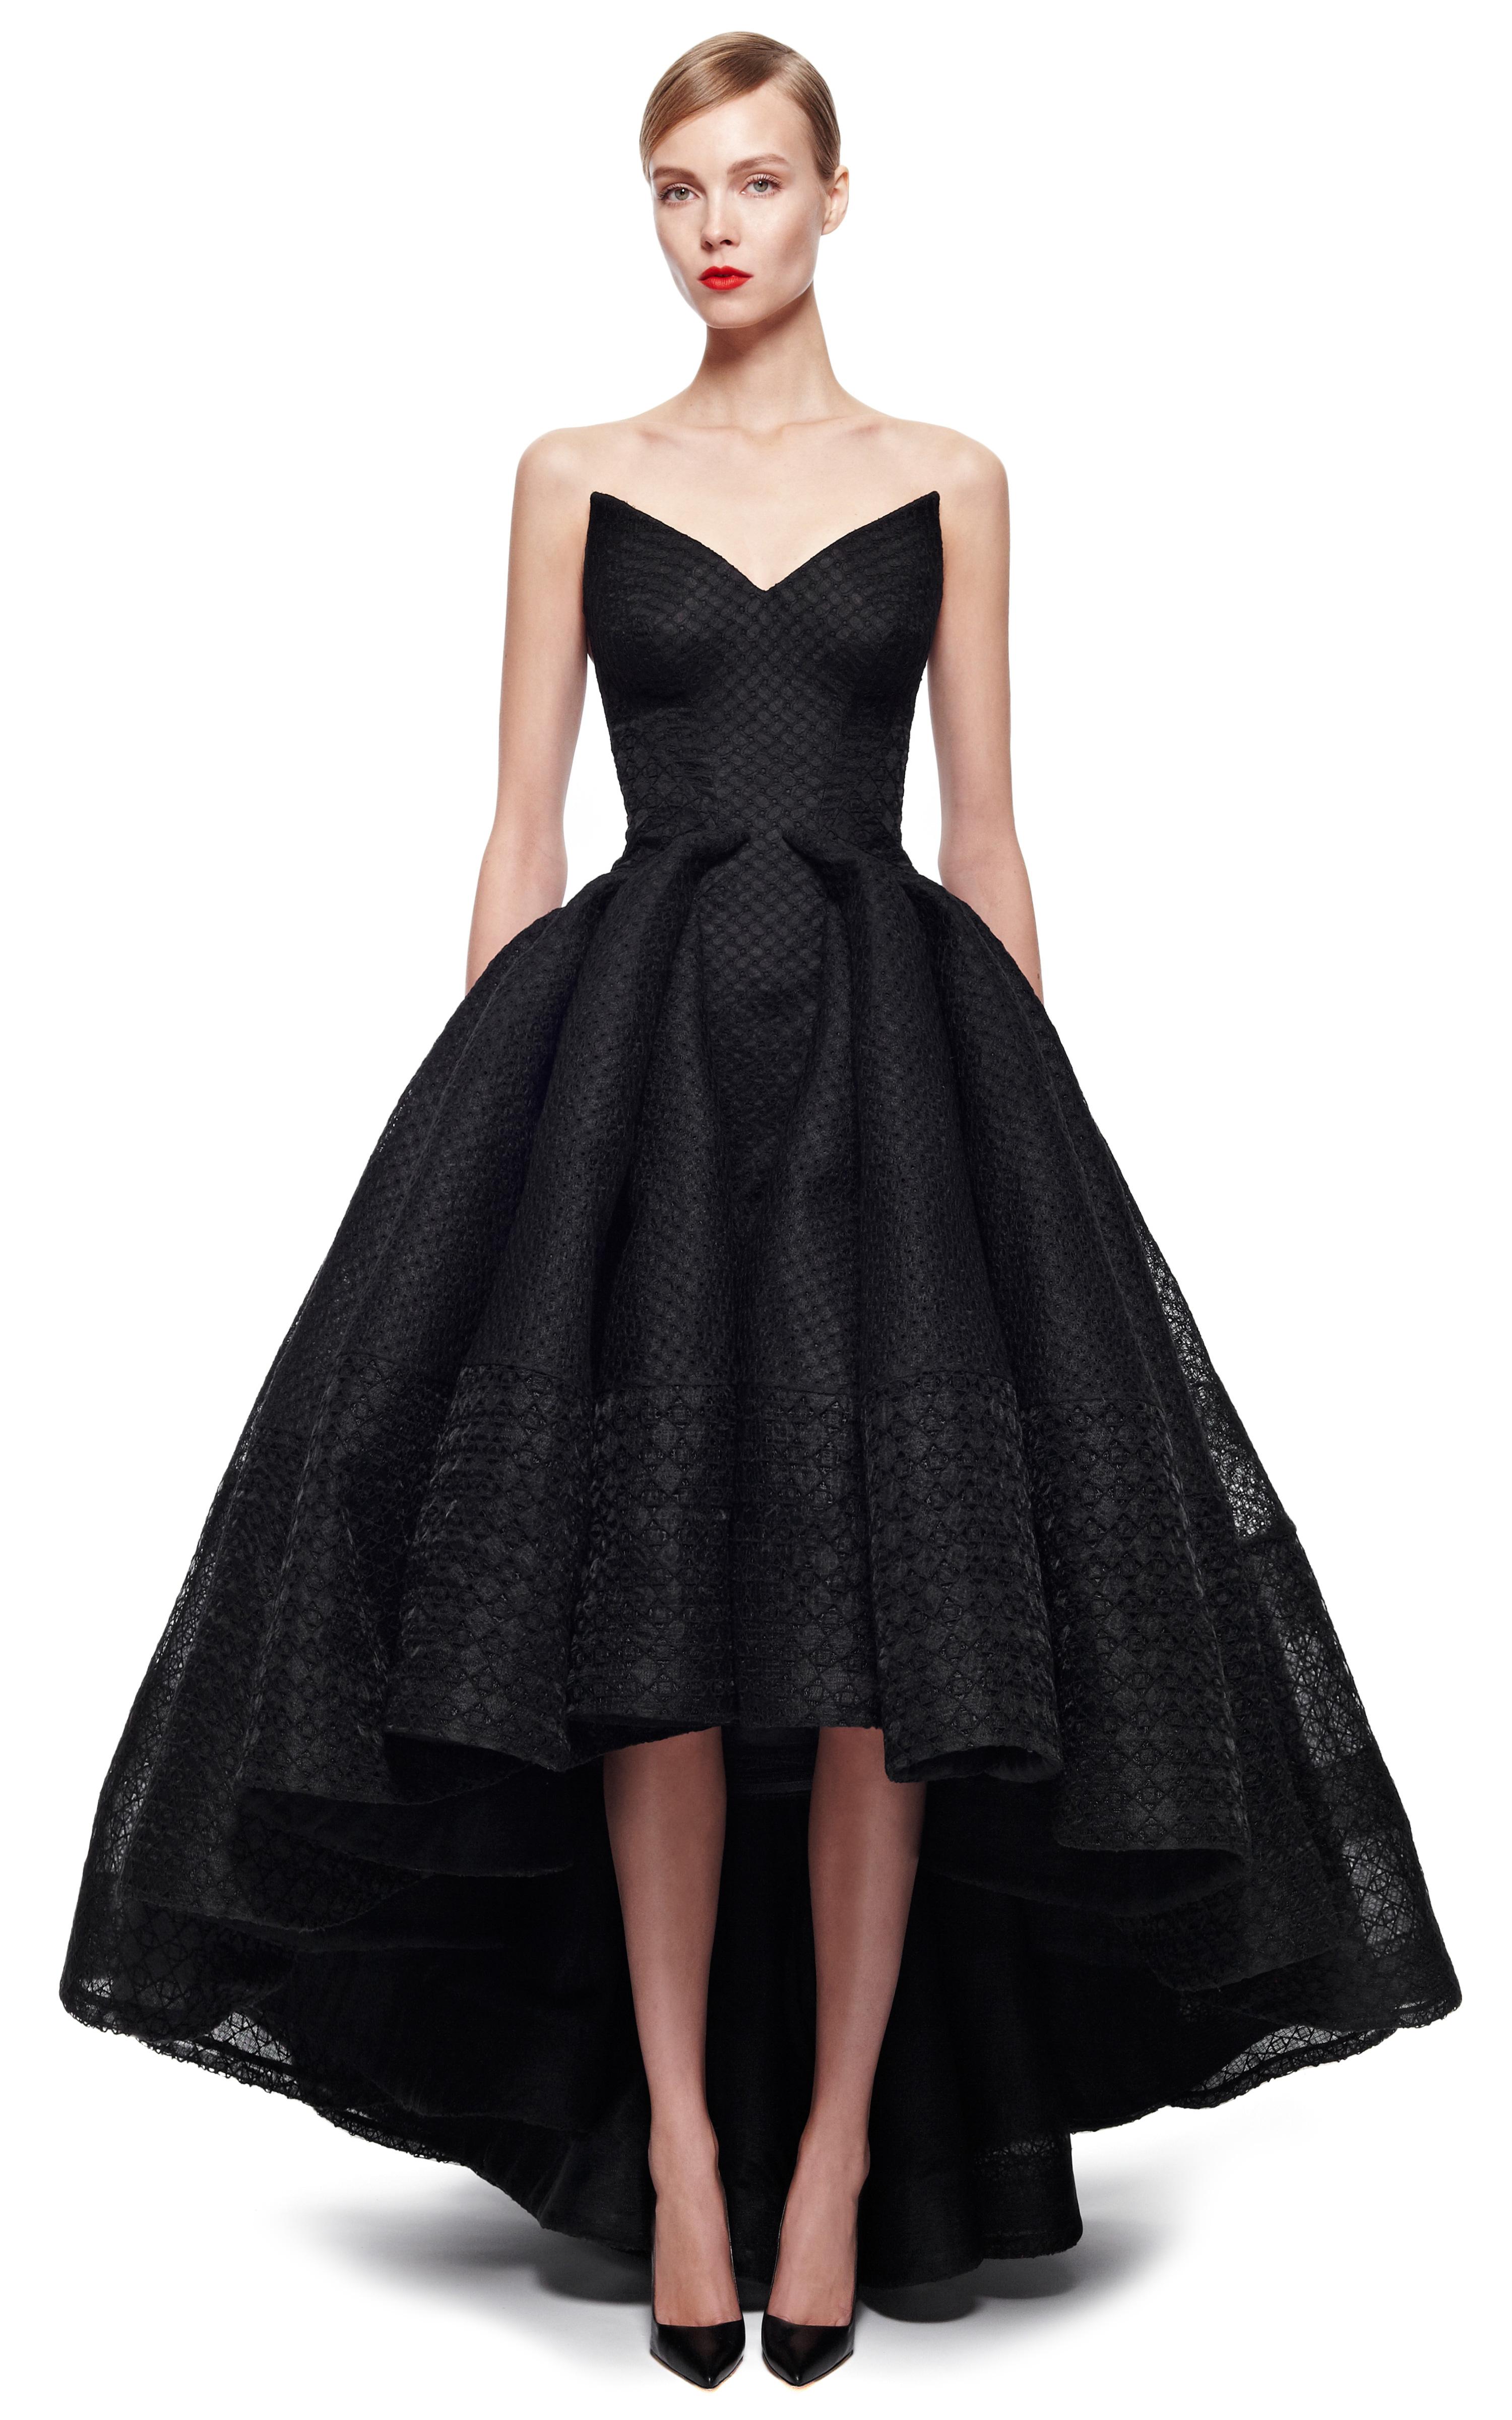 Lyst - Zac Posen Embroidered Organza Gown in Black